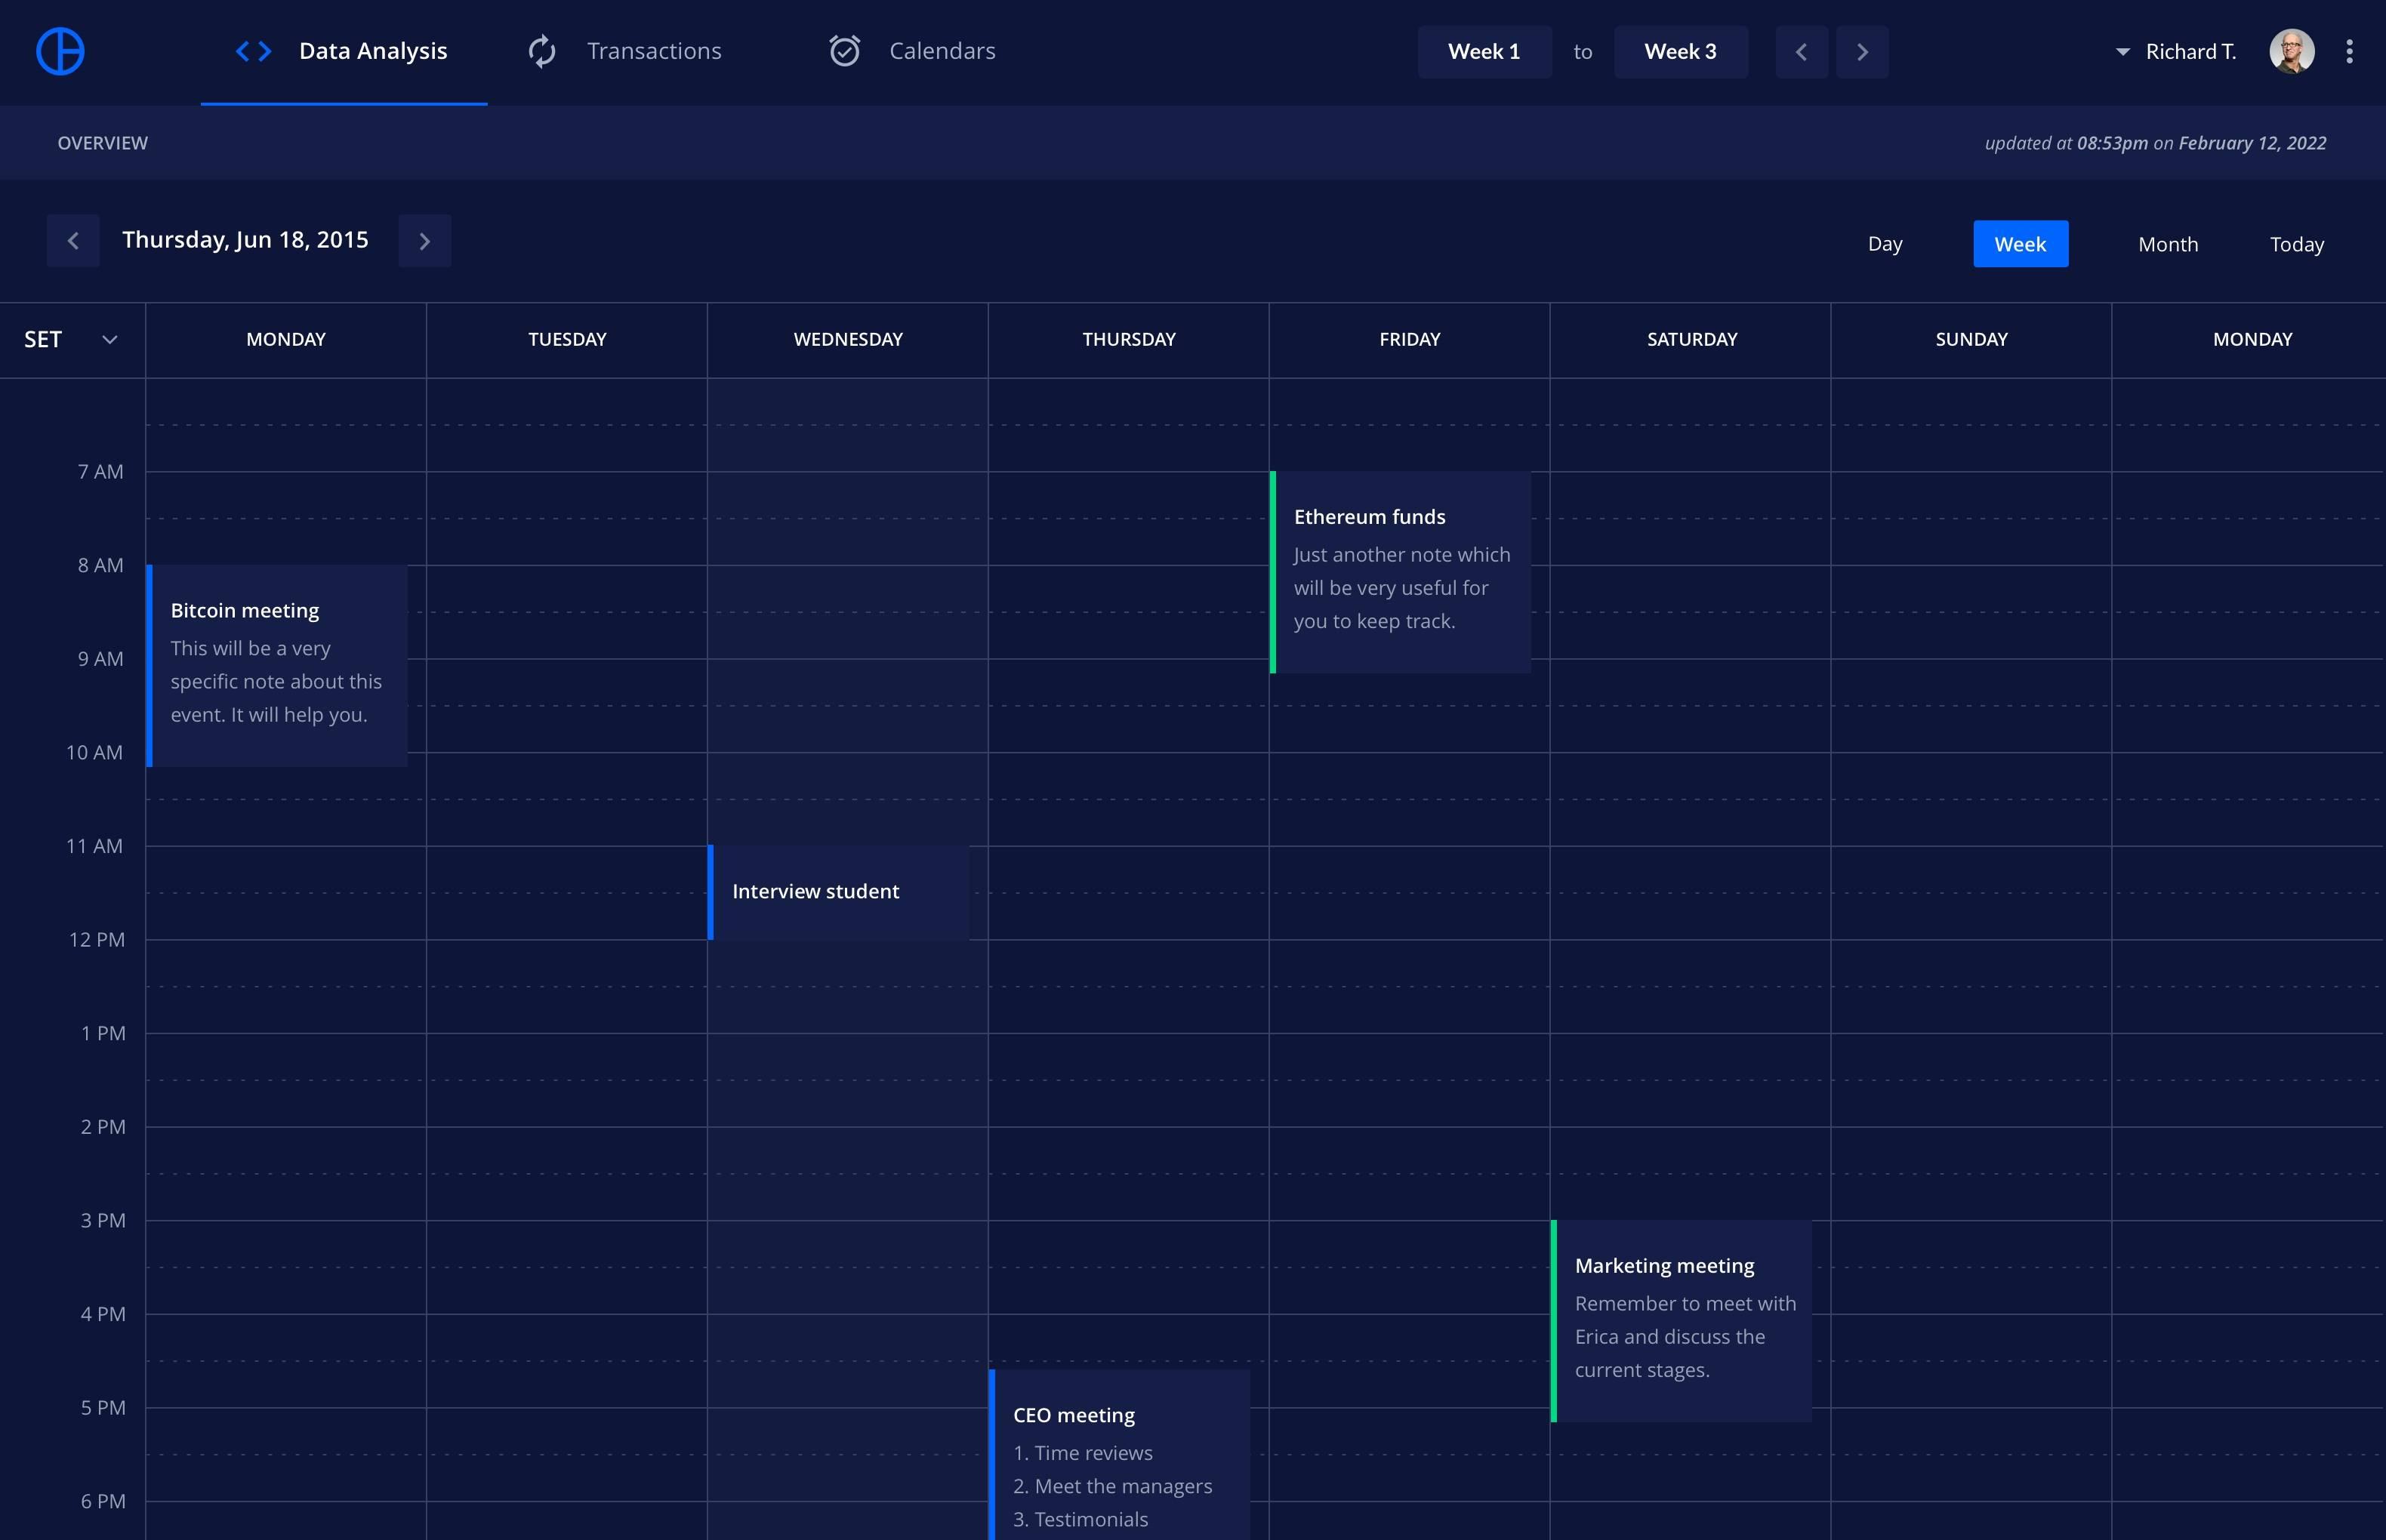 Calendar 日历应用界面.sketch素材下载 界面-第1张